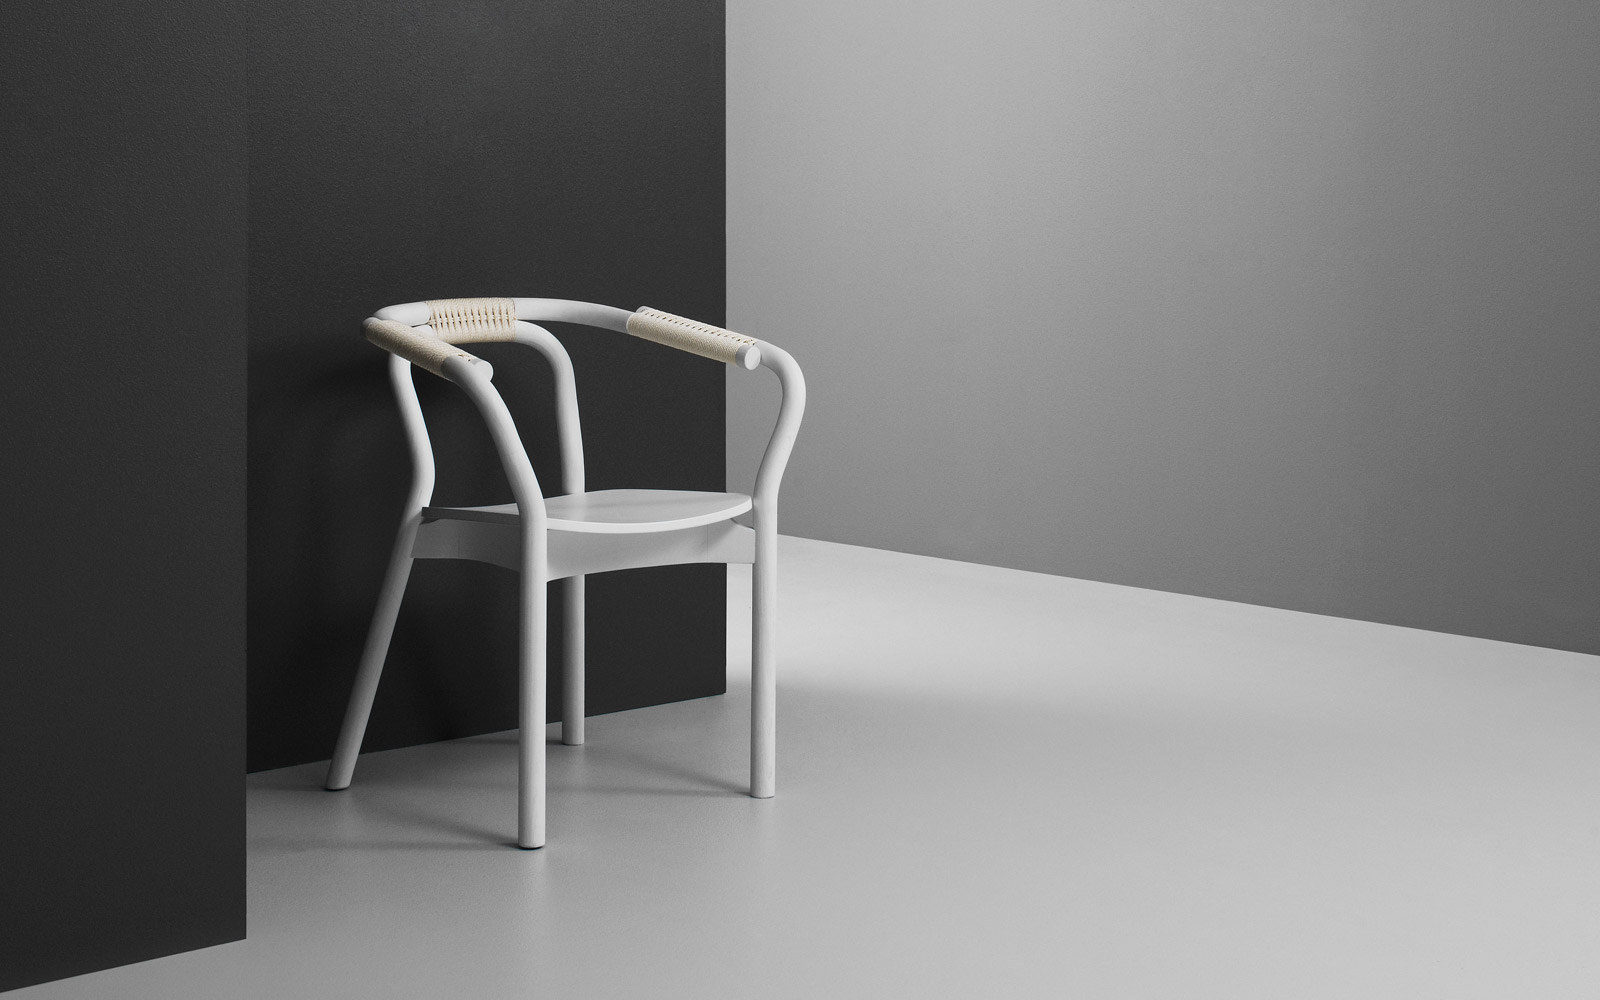 Knot Chair II